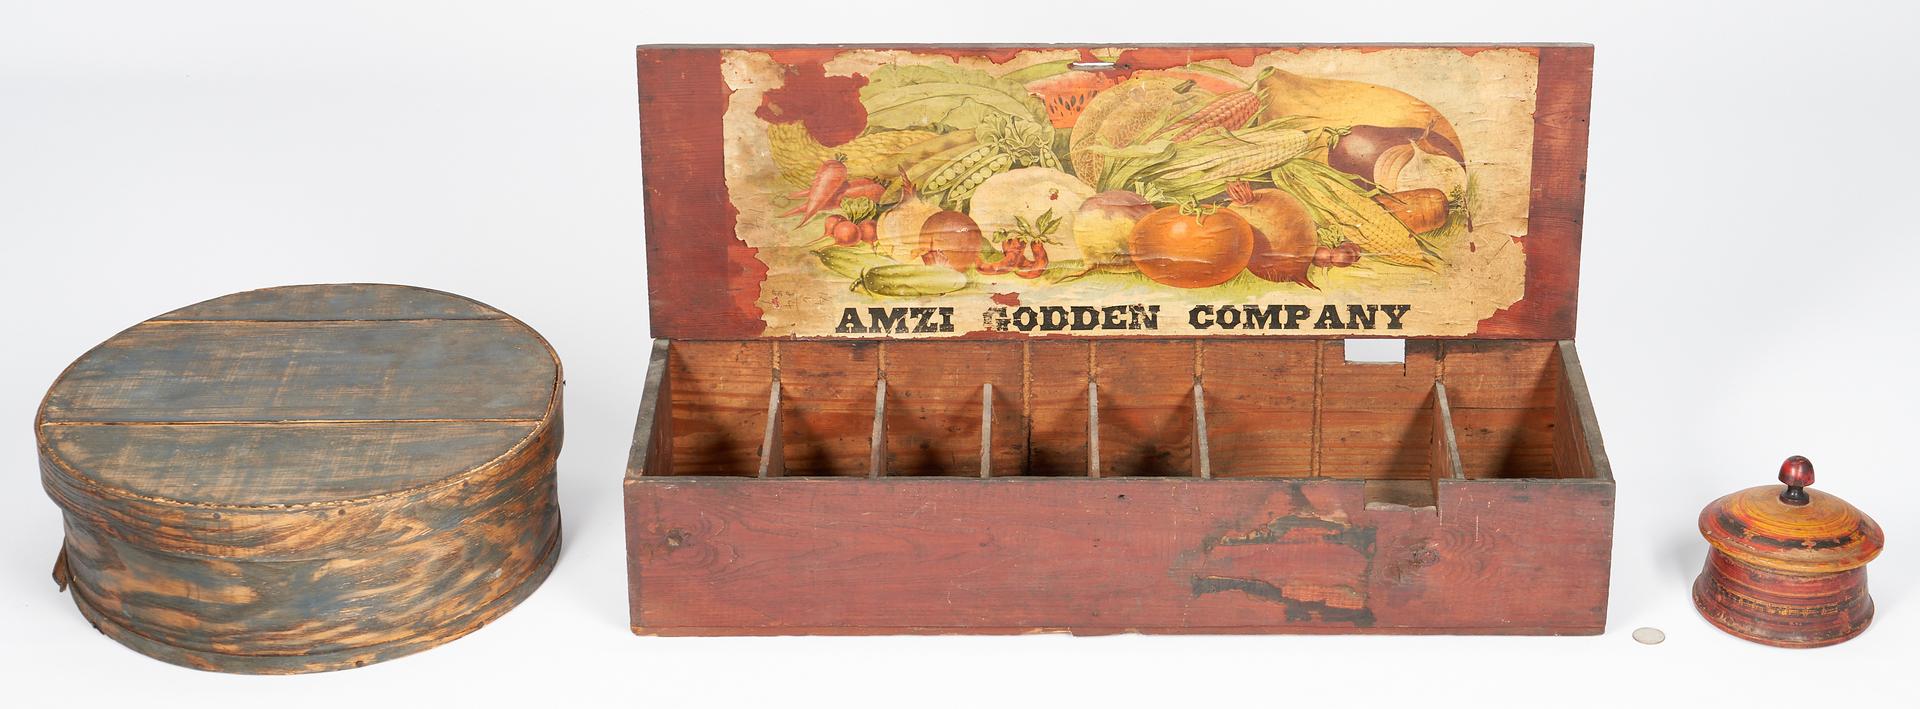 Lot 848: 3 Primitive Boxes, incl. Alabama Seed Box, Pantry Box, & Round Box